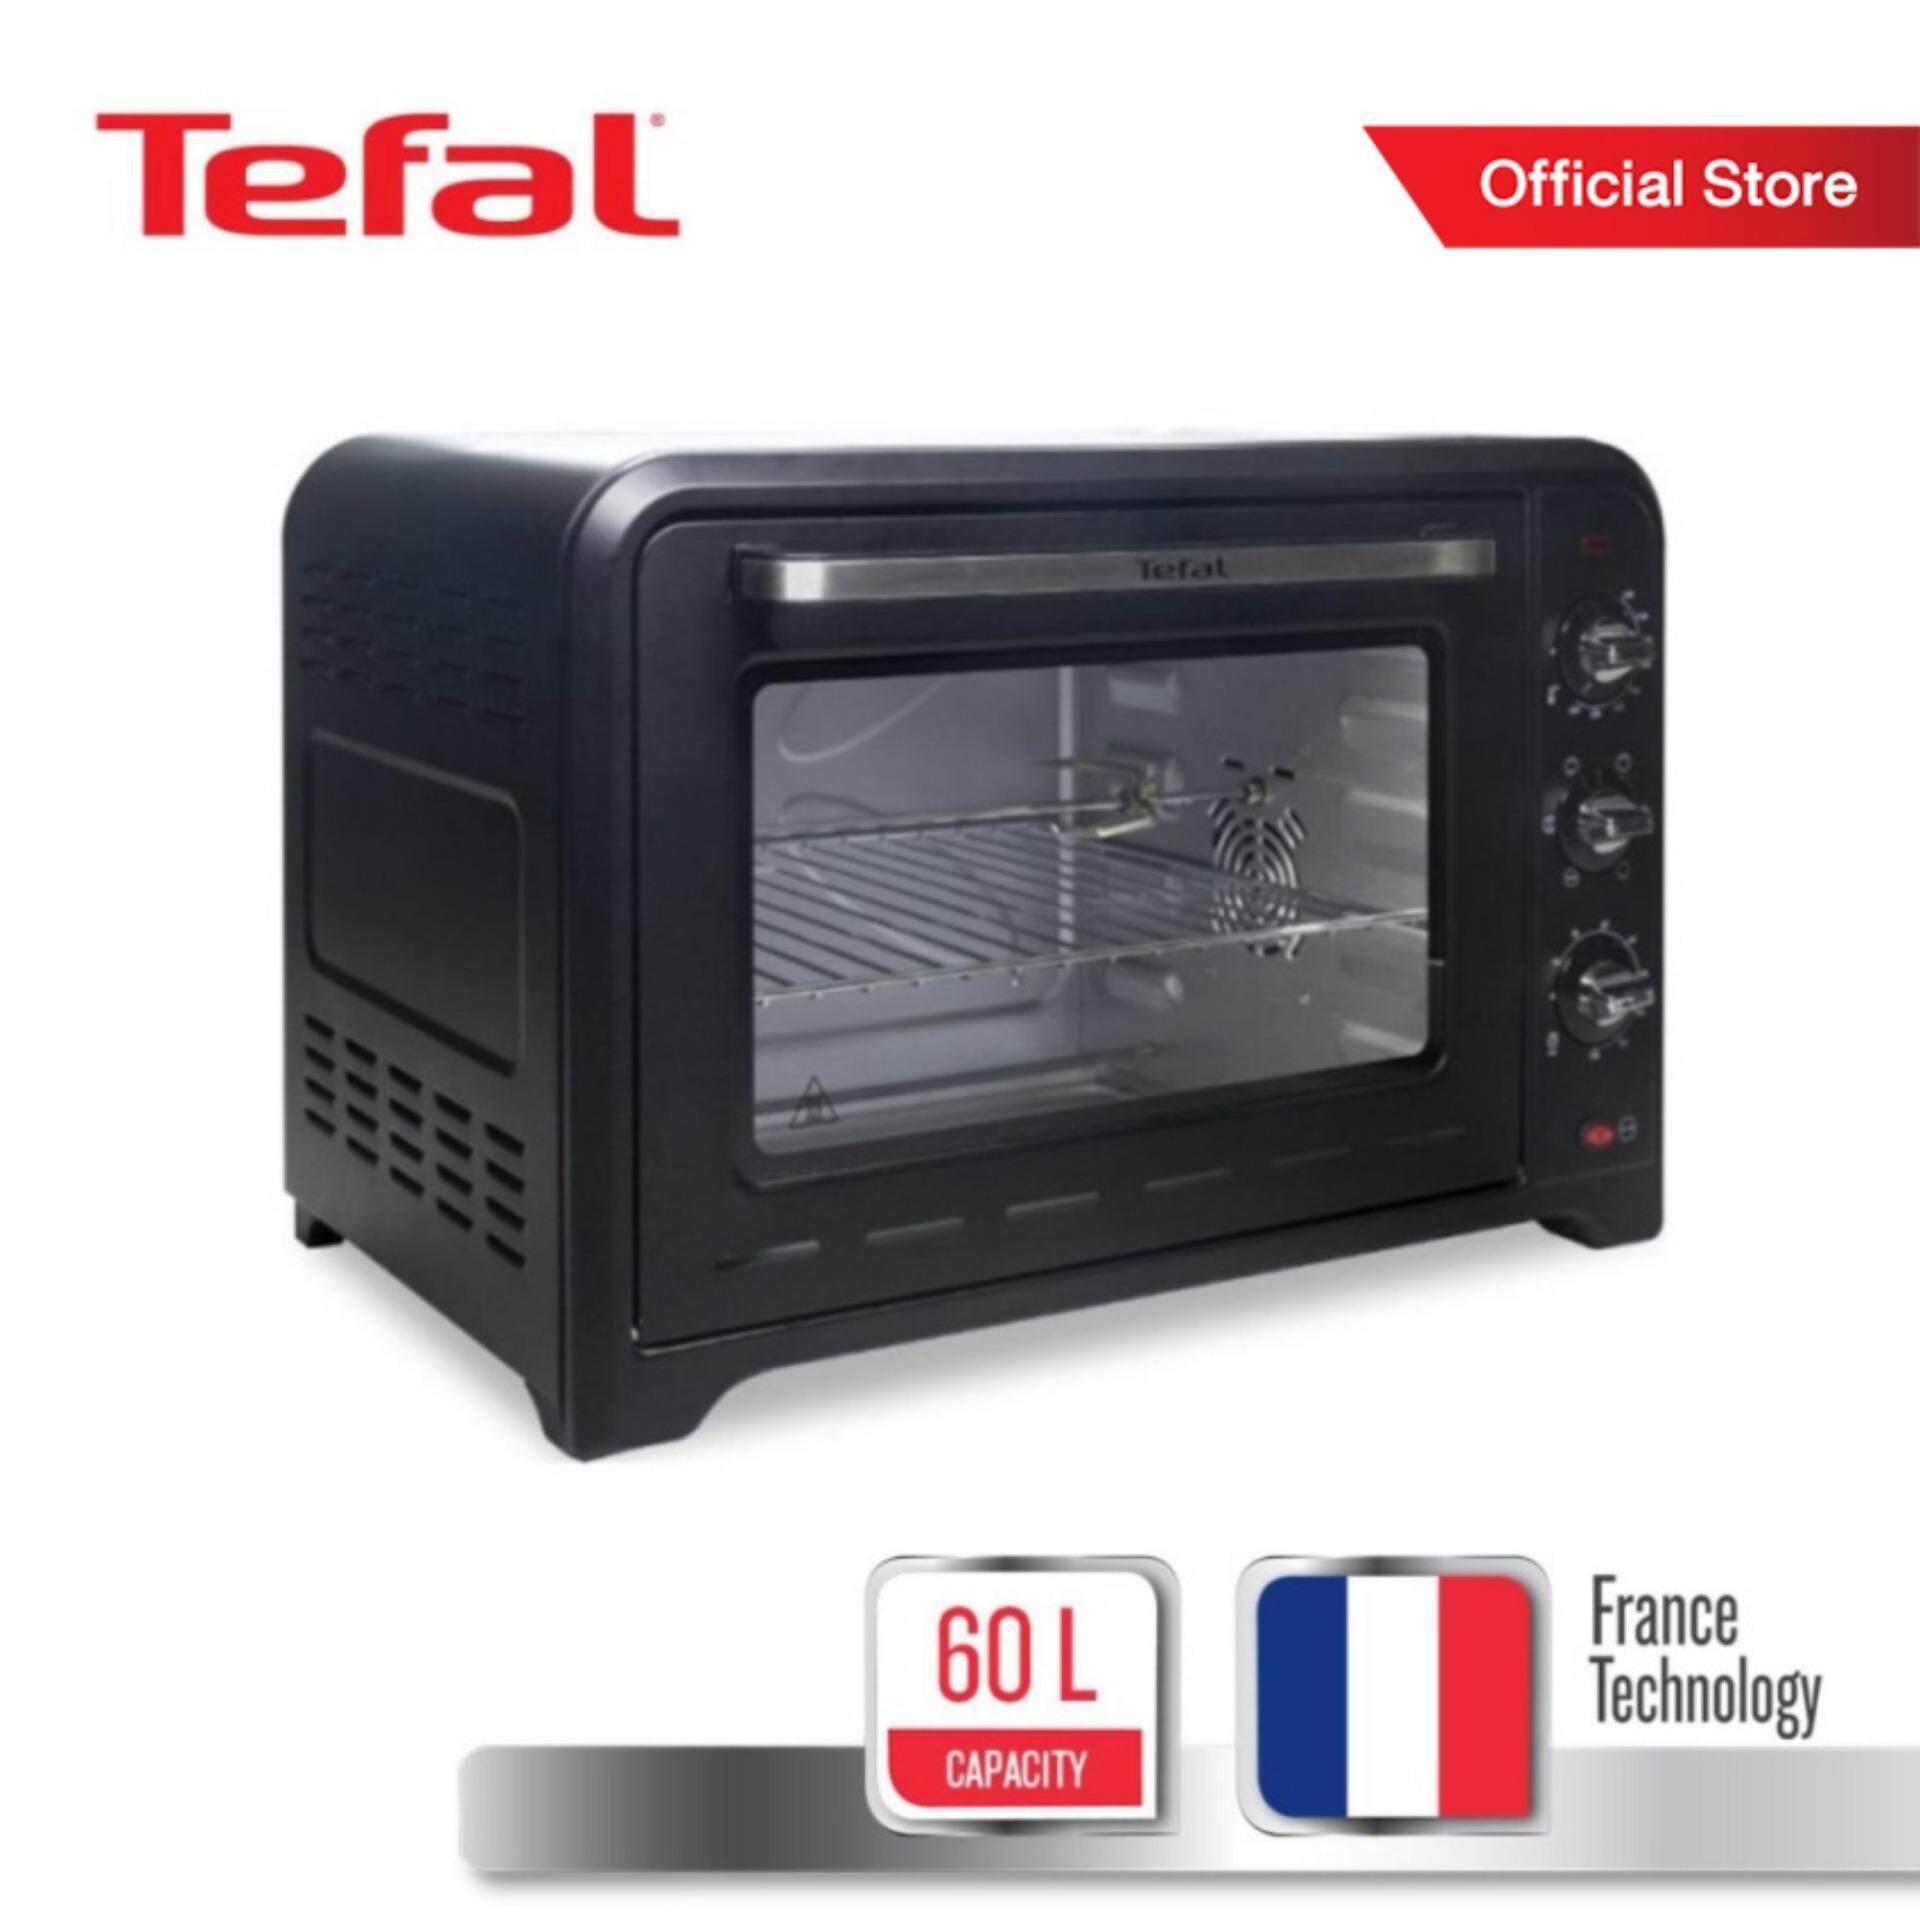 Tefal เตาอบ Oven Optimo กำลังไฟ 2,400 วัตต์ ขนาดความจุ 60 ลิตร รุ่น Of4958 -Black.